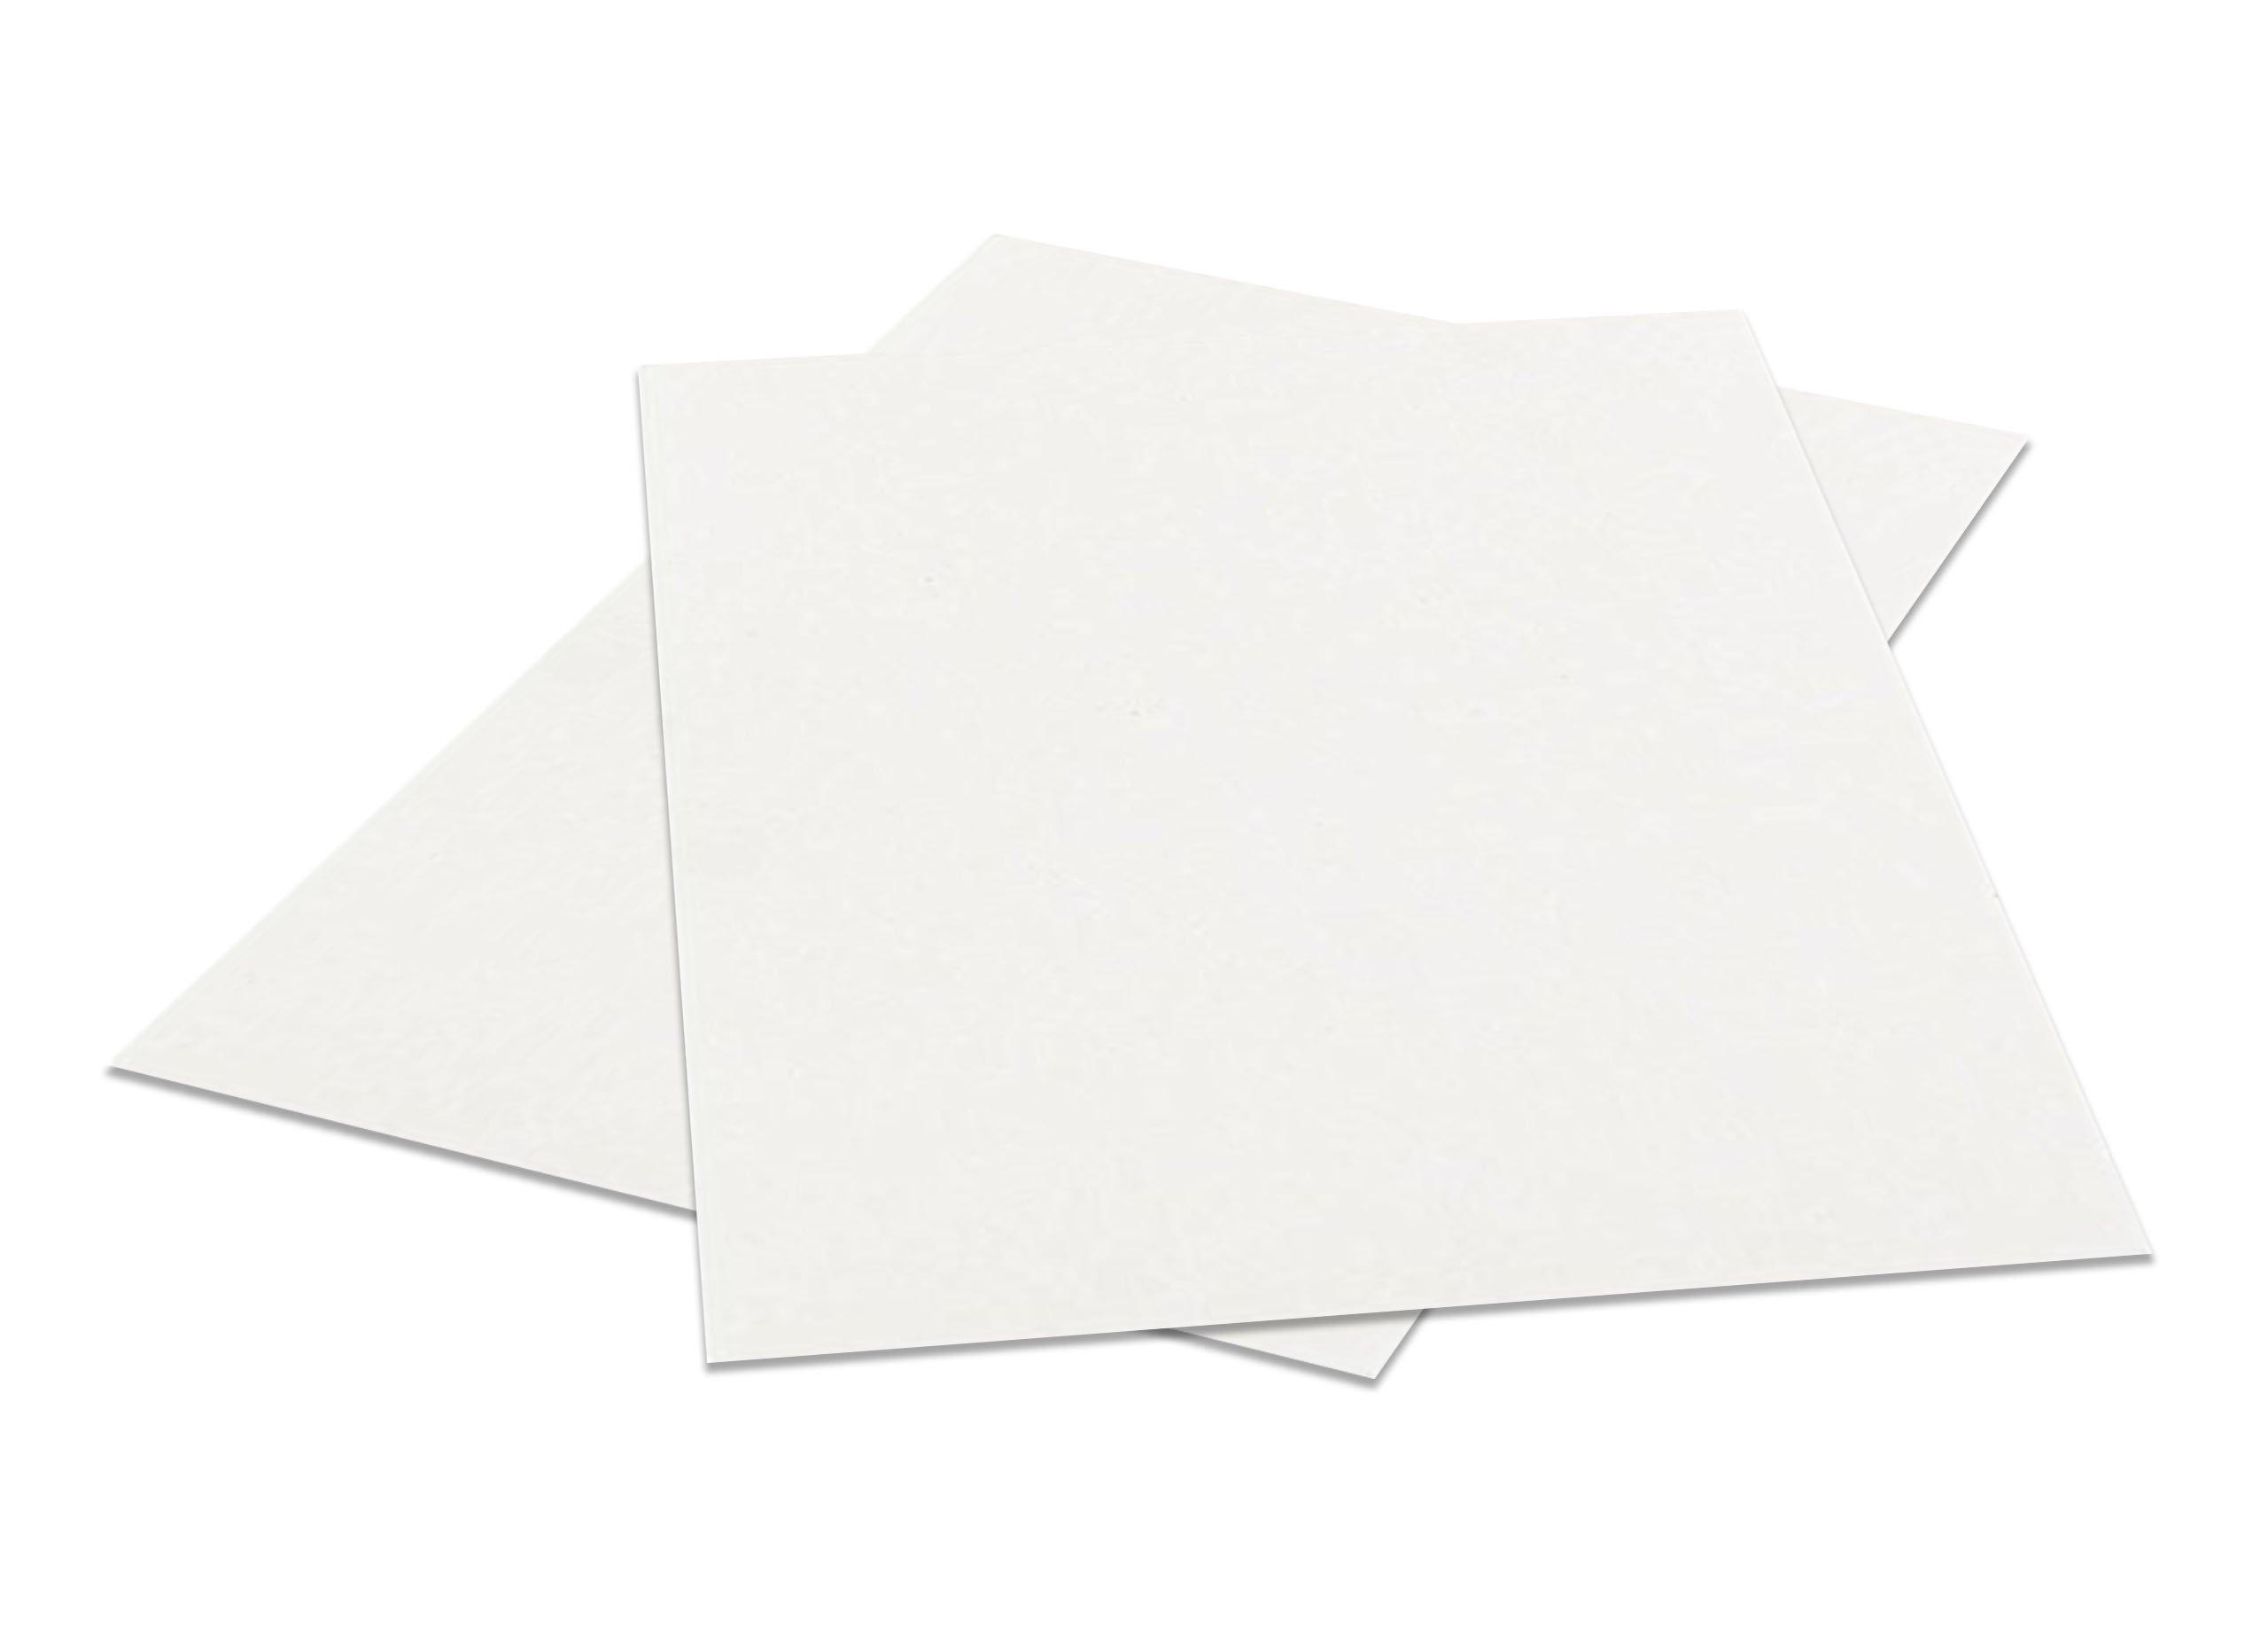 12'' X 12'' White Chipboard - Cardboard Medium Weight Chipboard Sheets - 25 Per Pack.